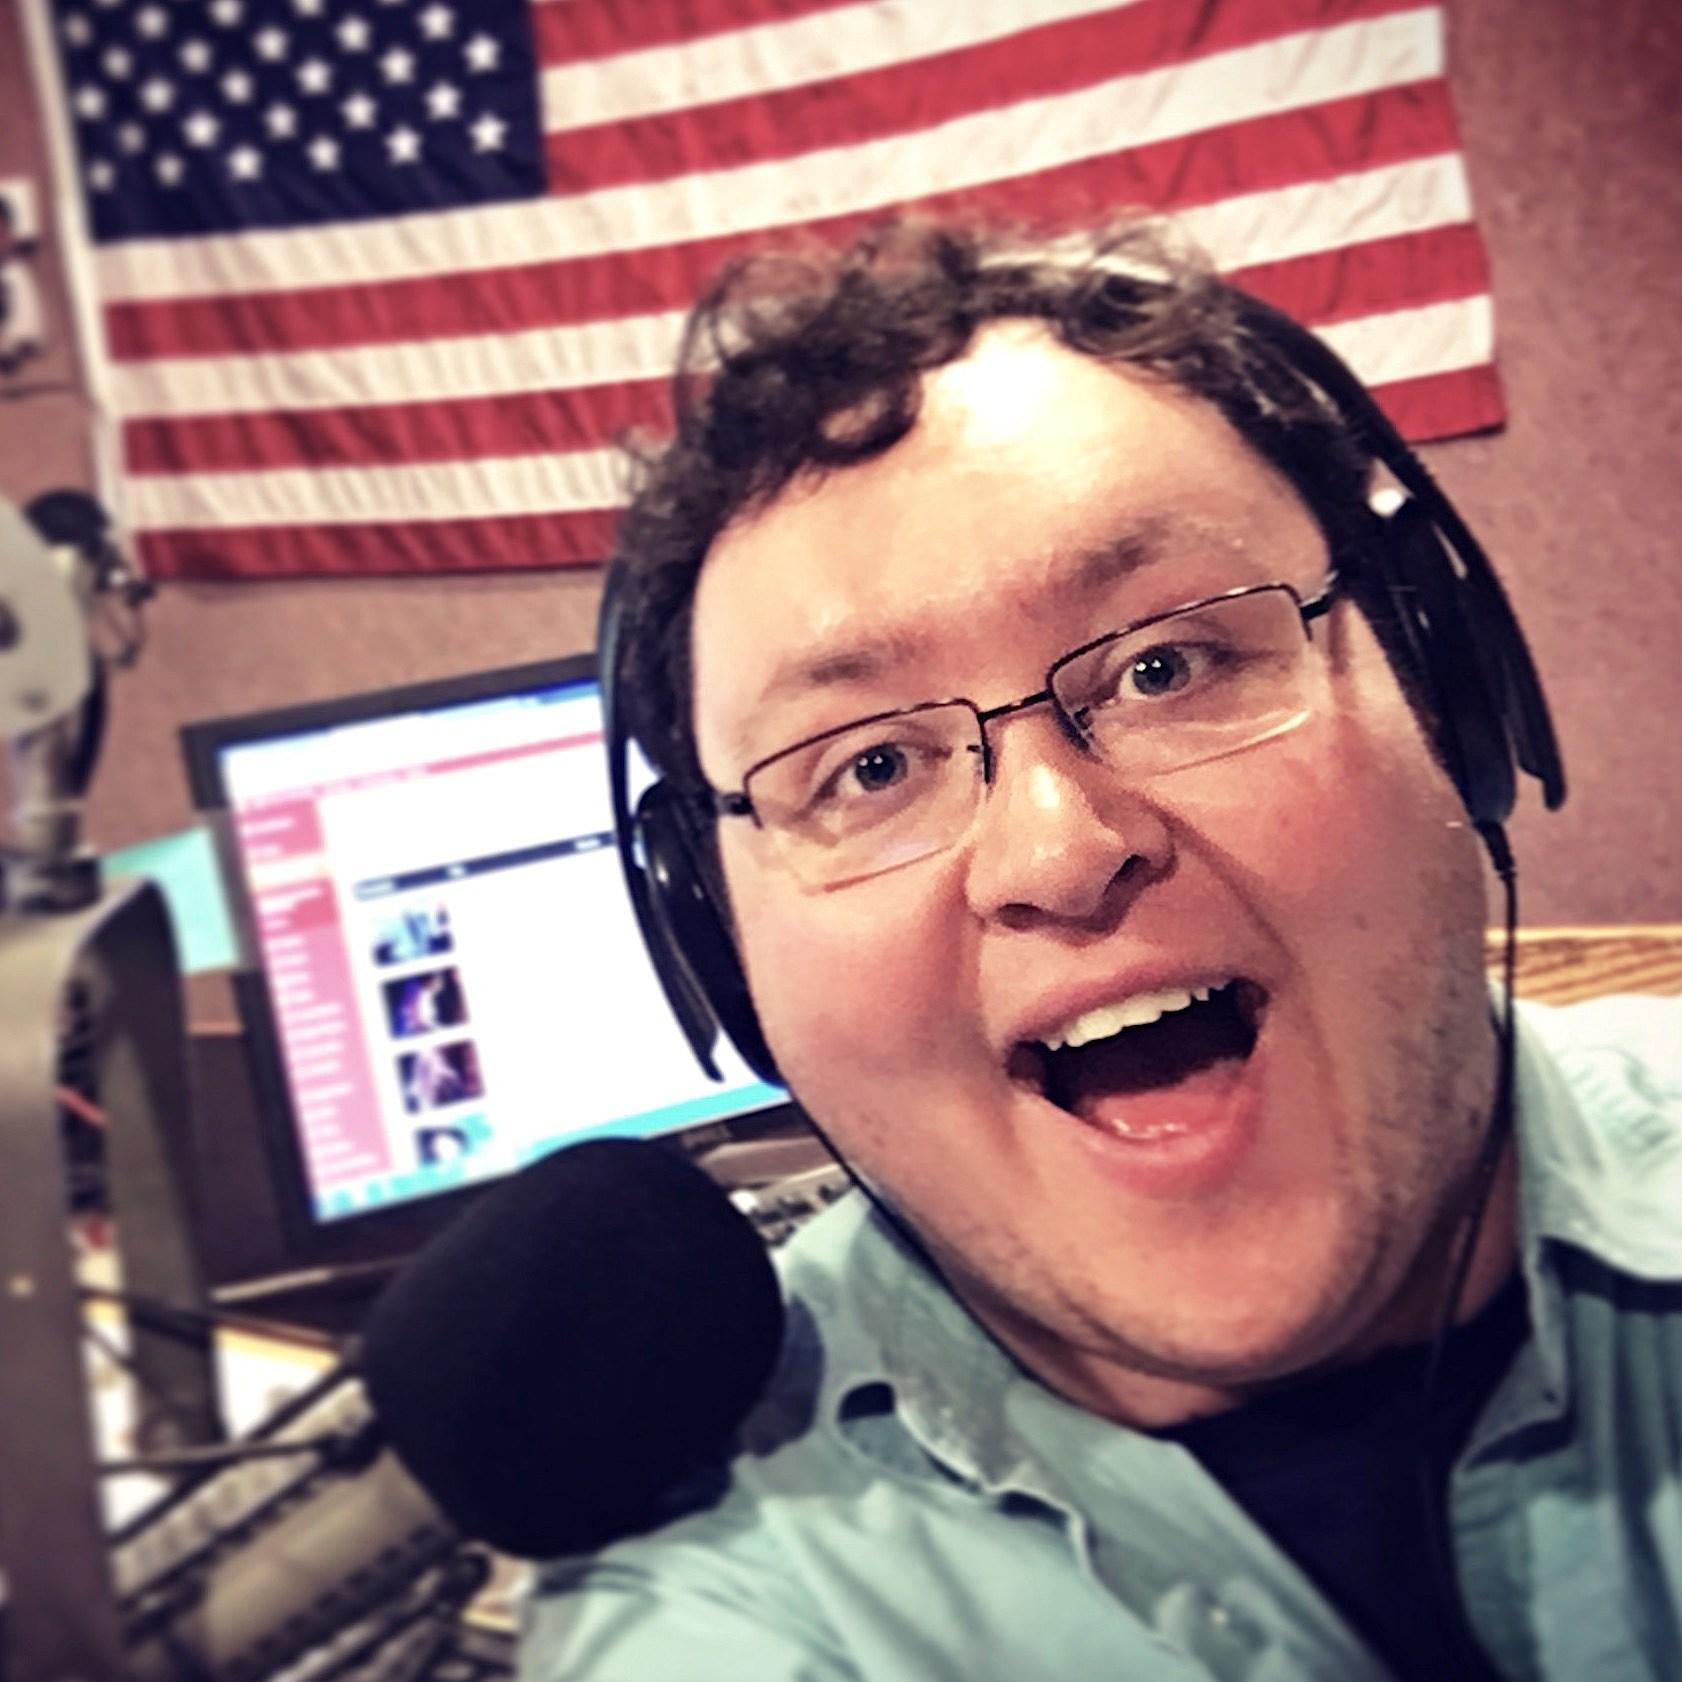 943 WCYY Maines Rock Alternative Portland Radio